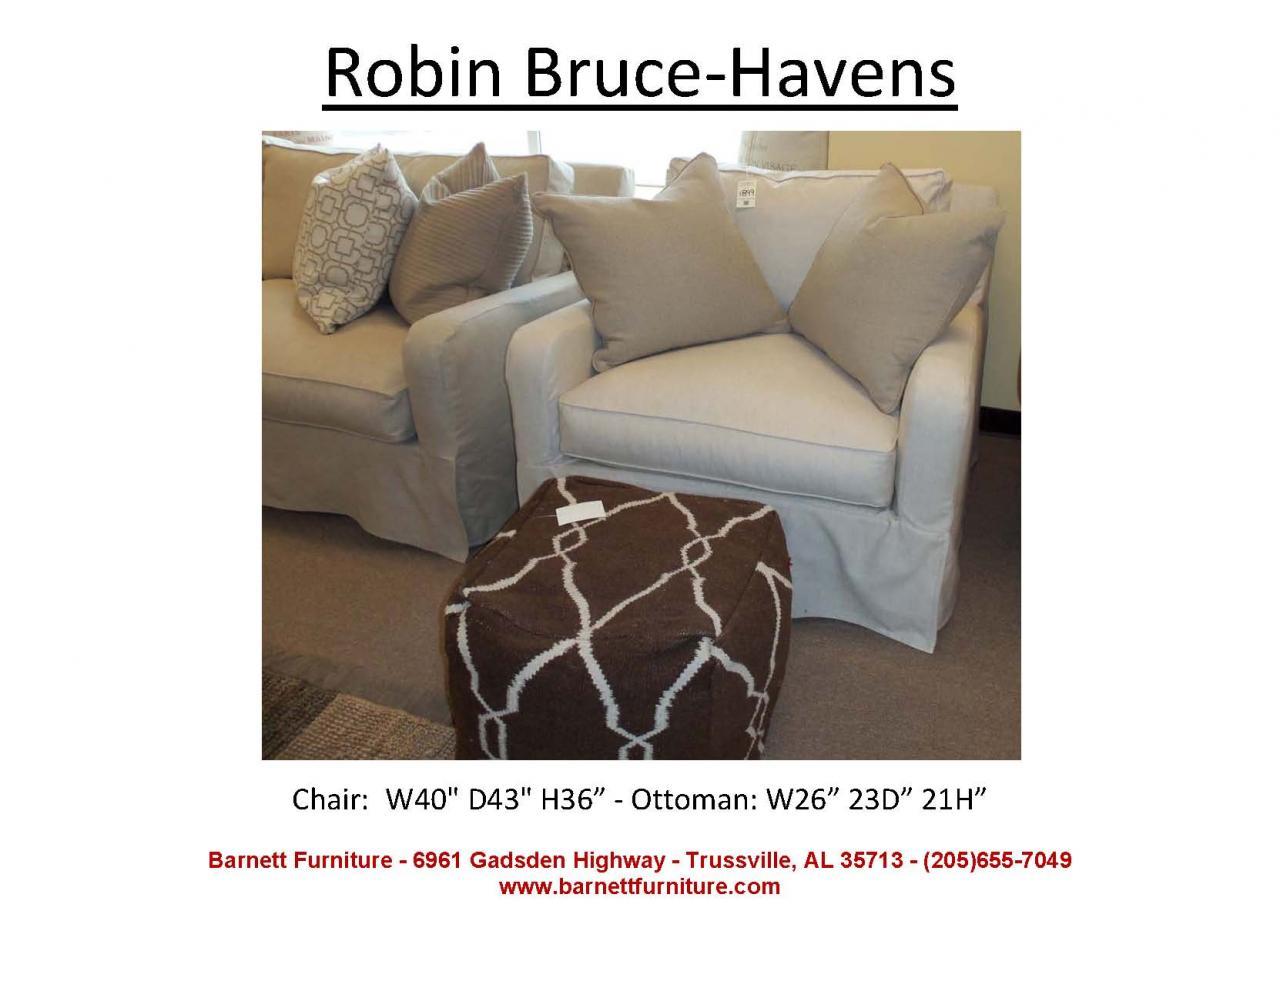 Robin Bruce Havens Slipcover Chair